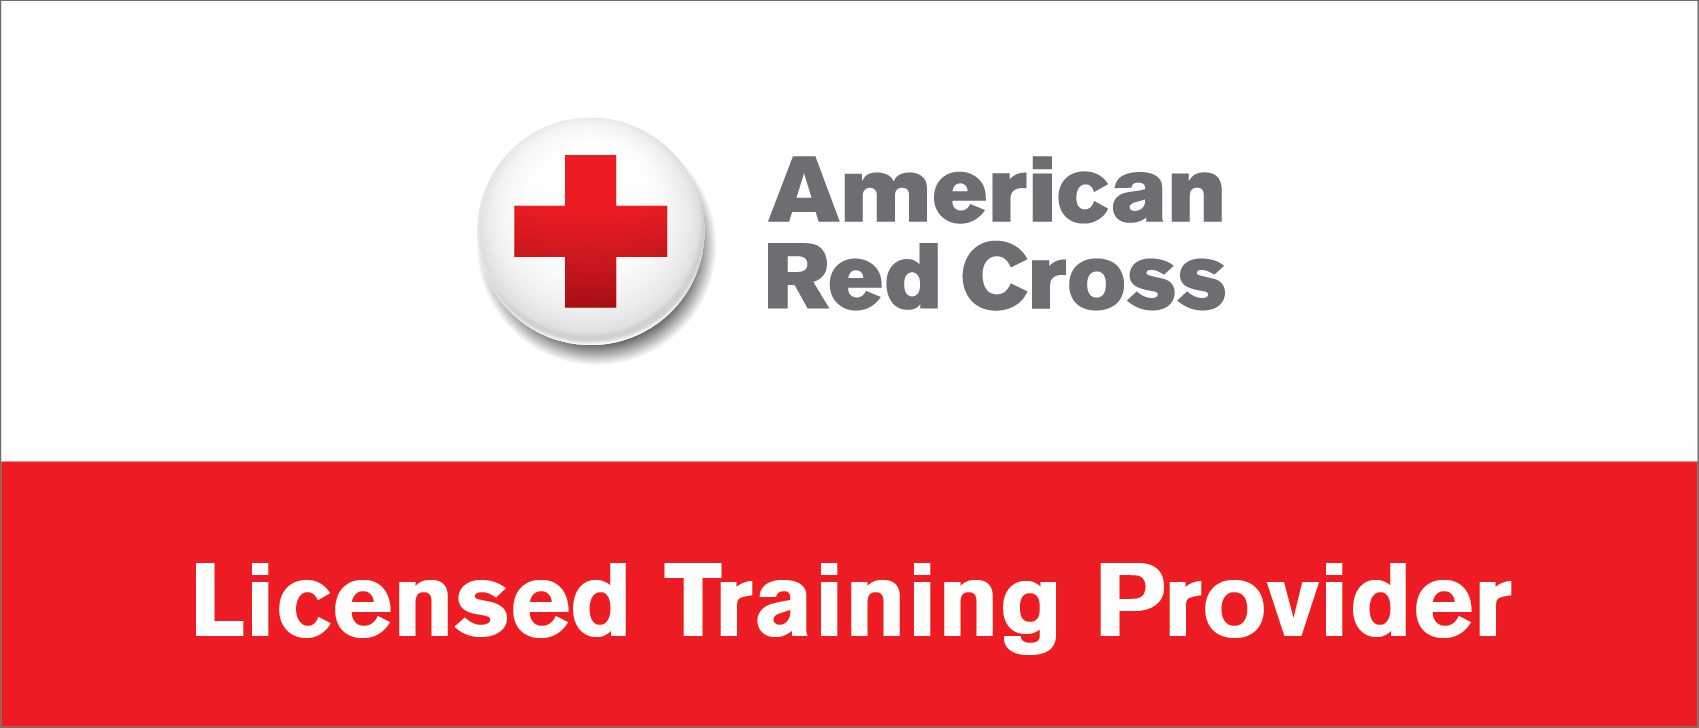 American Red Cross Licensed Training Provider